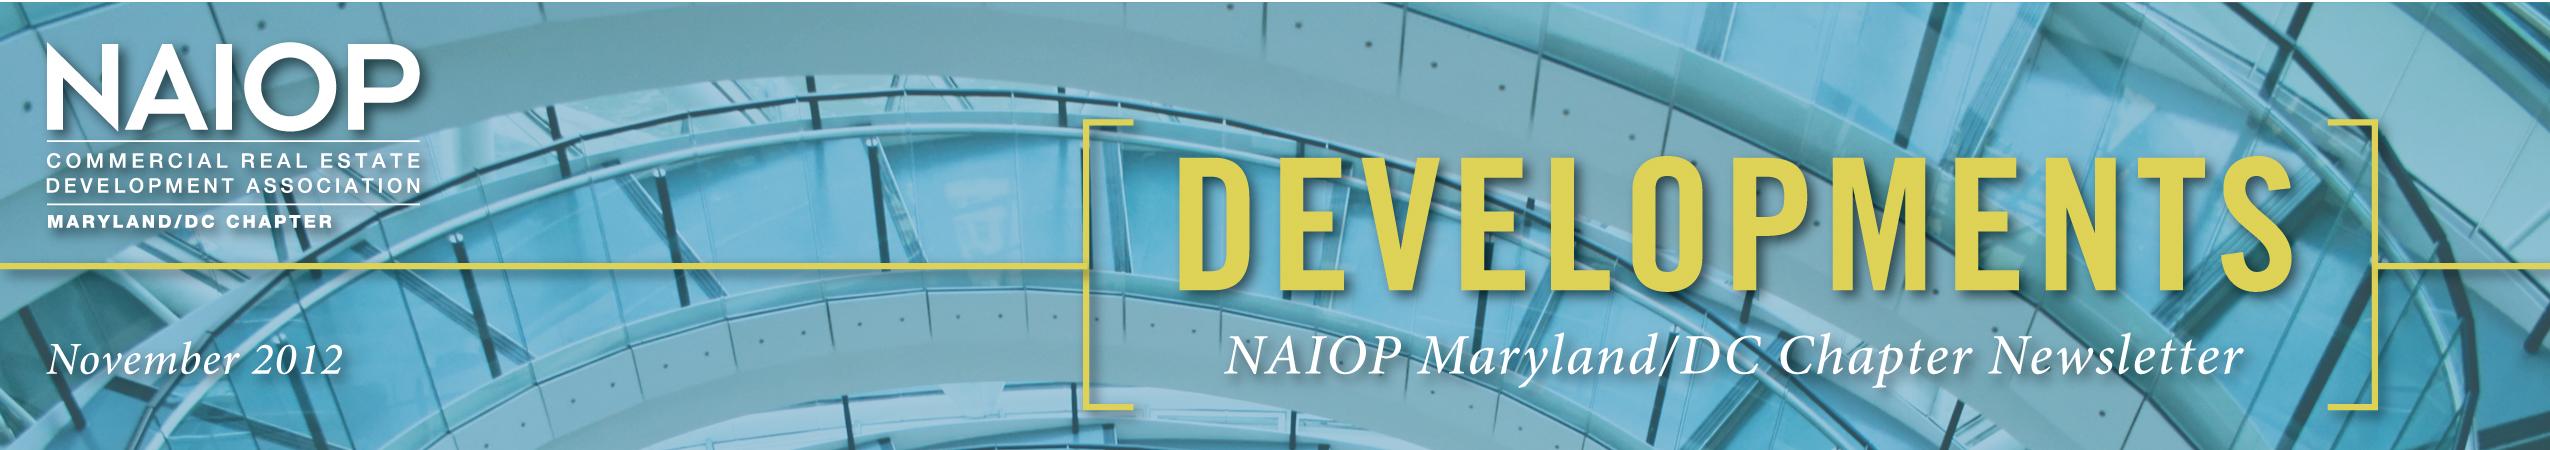 NAIOP Developments Newsletter - November 2012